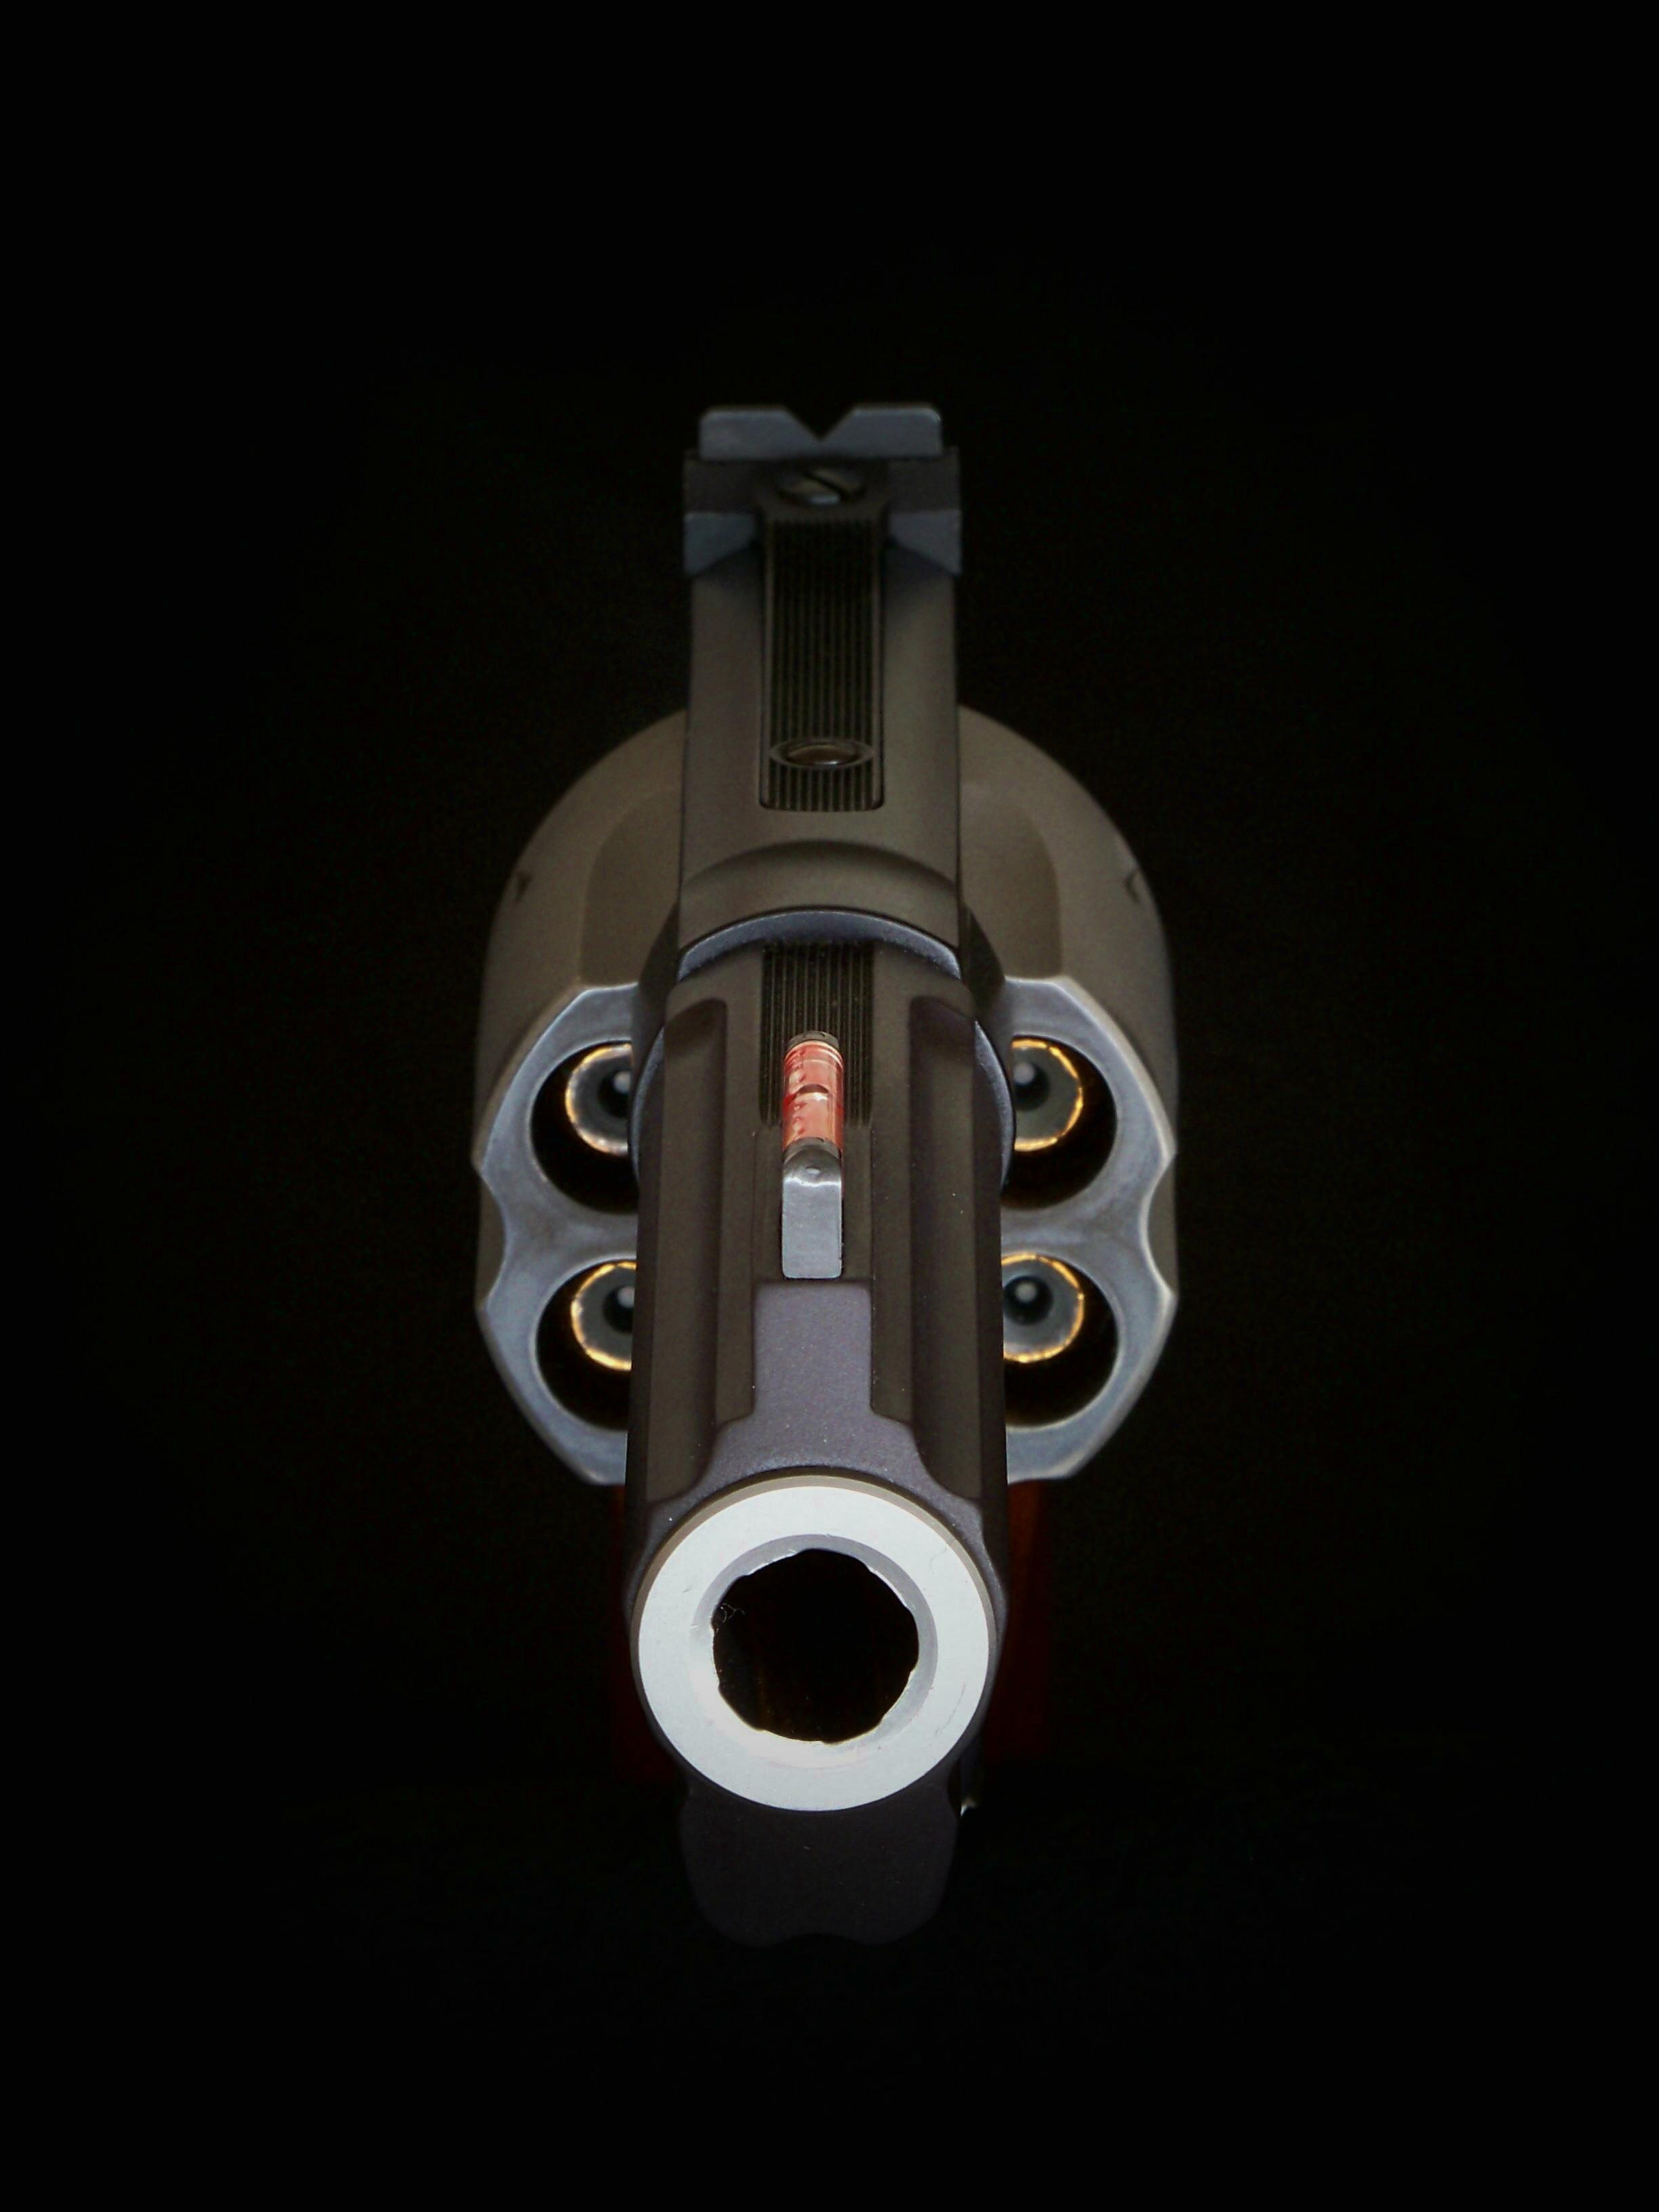 Revolvers Becoming Popular Again-100_2895_edited-1.jpg